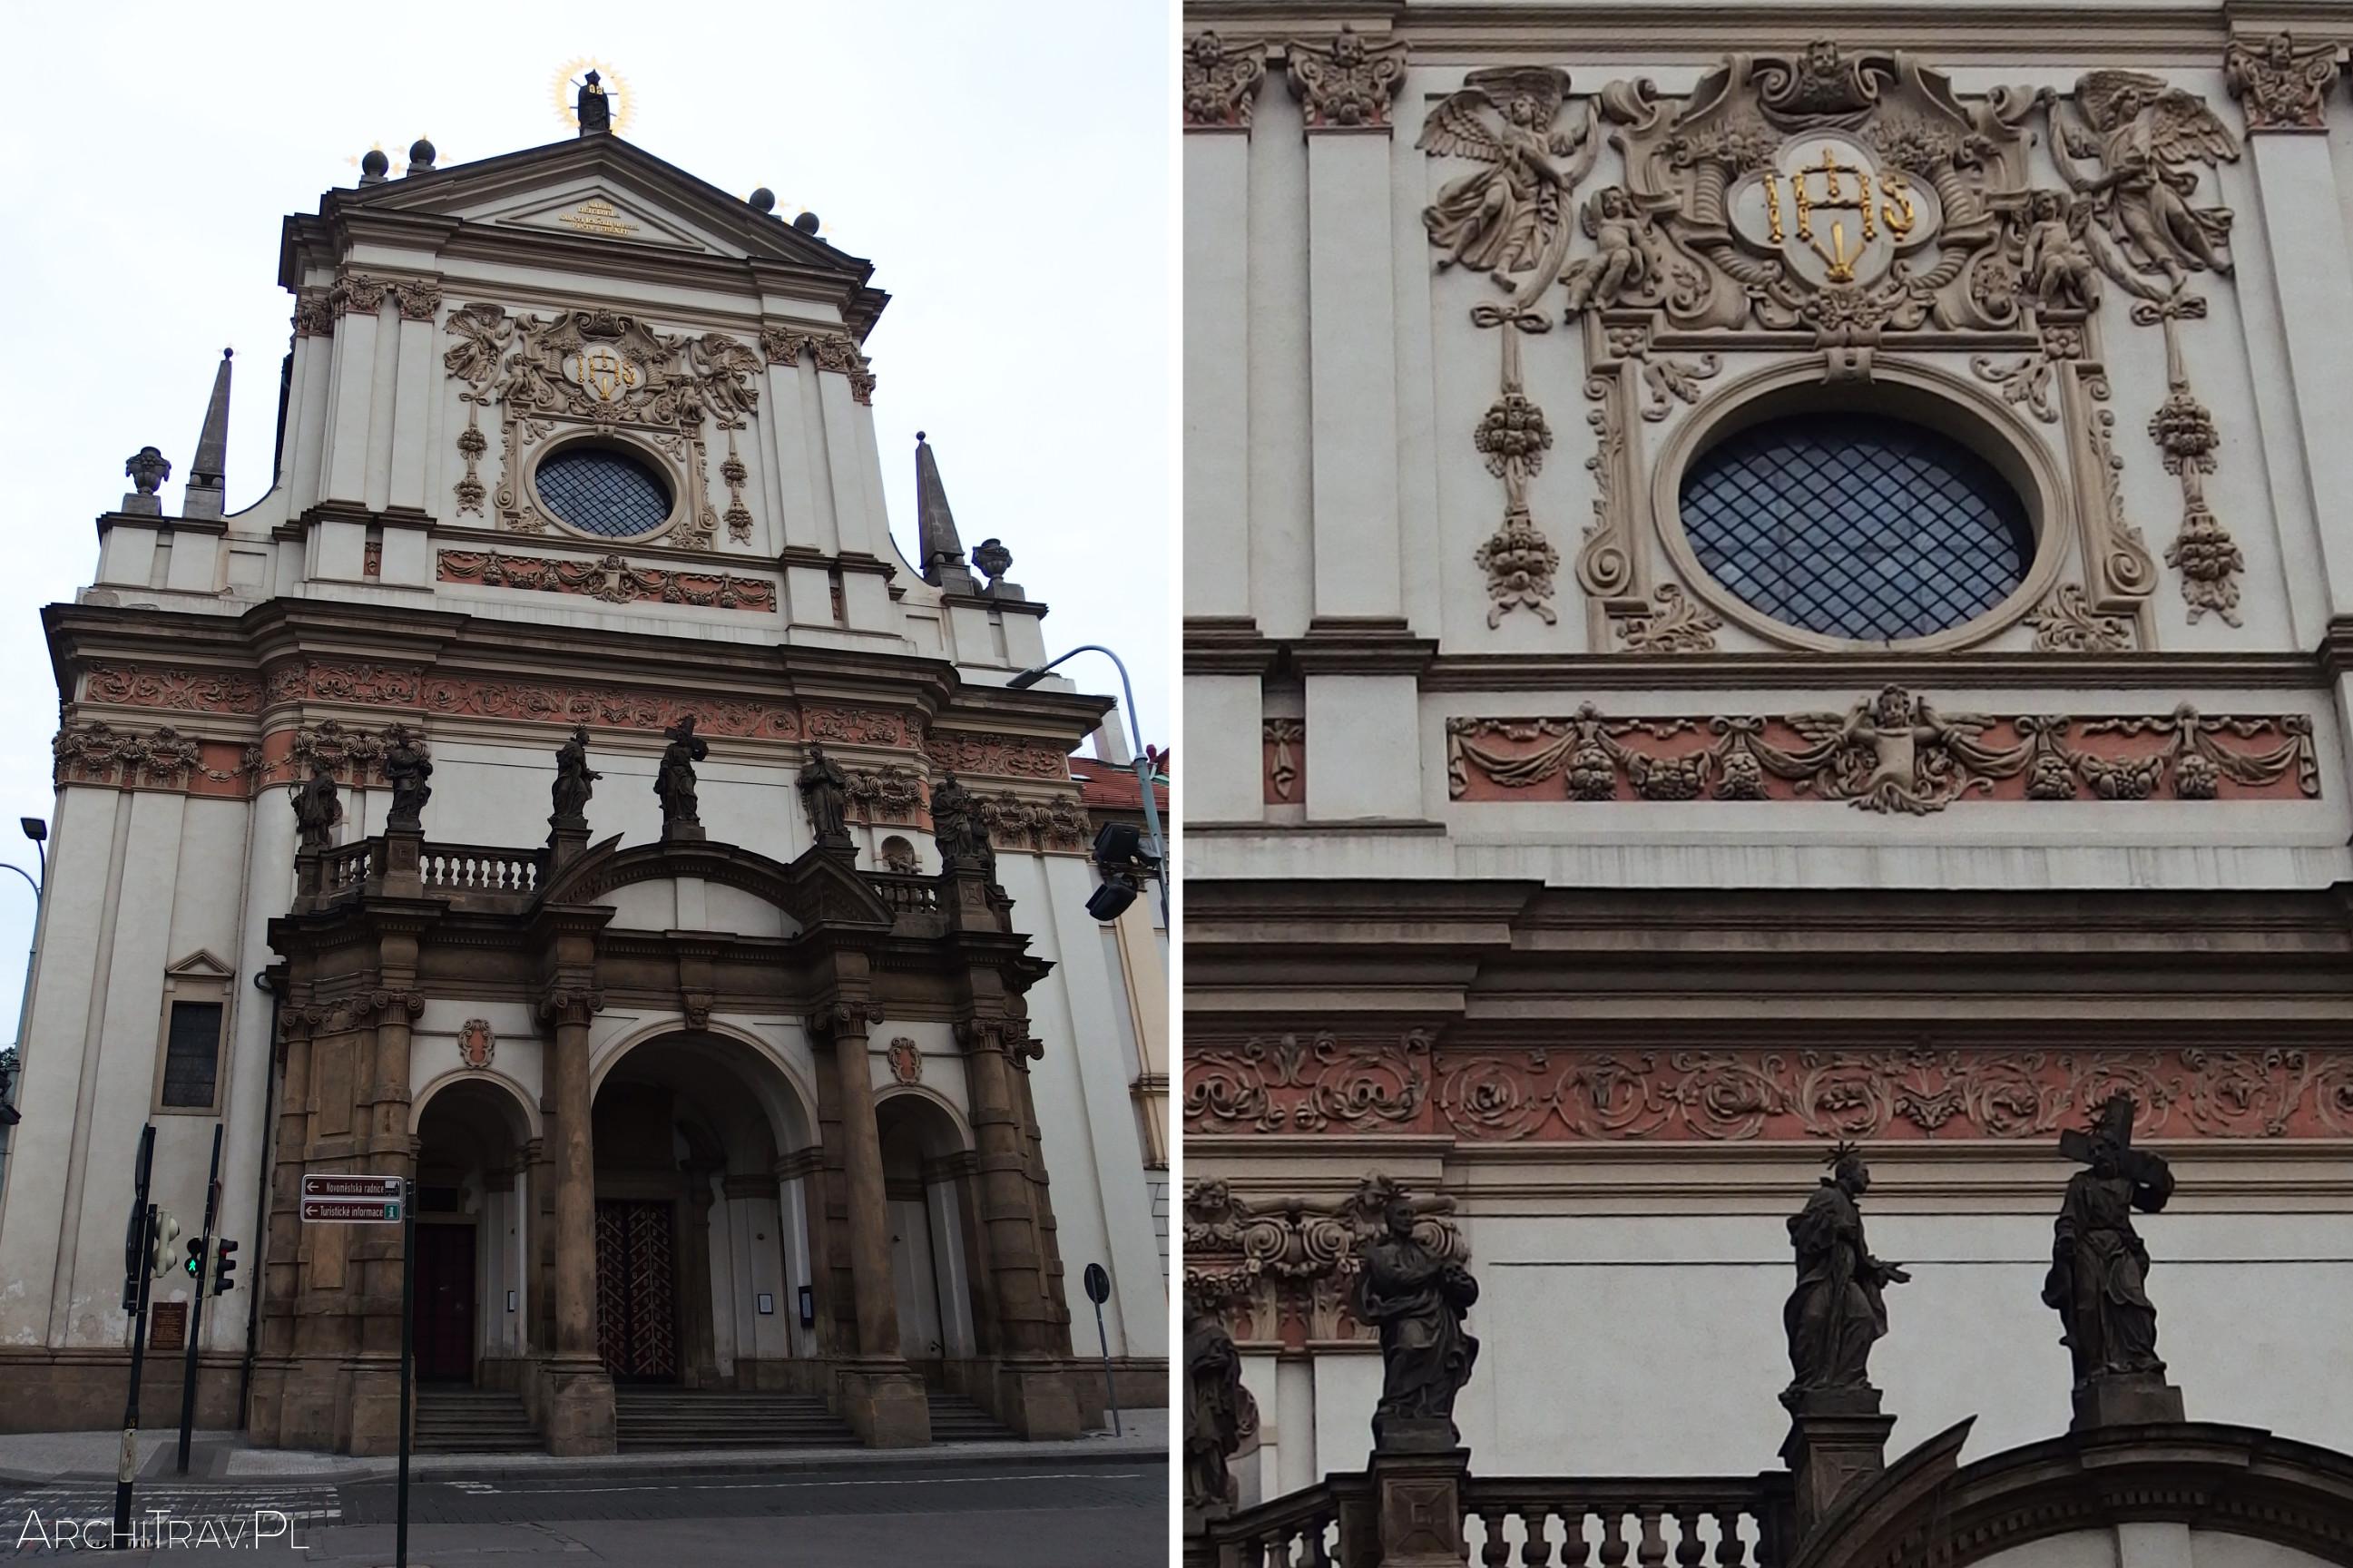 kostel-sv-ignace-praha